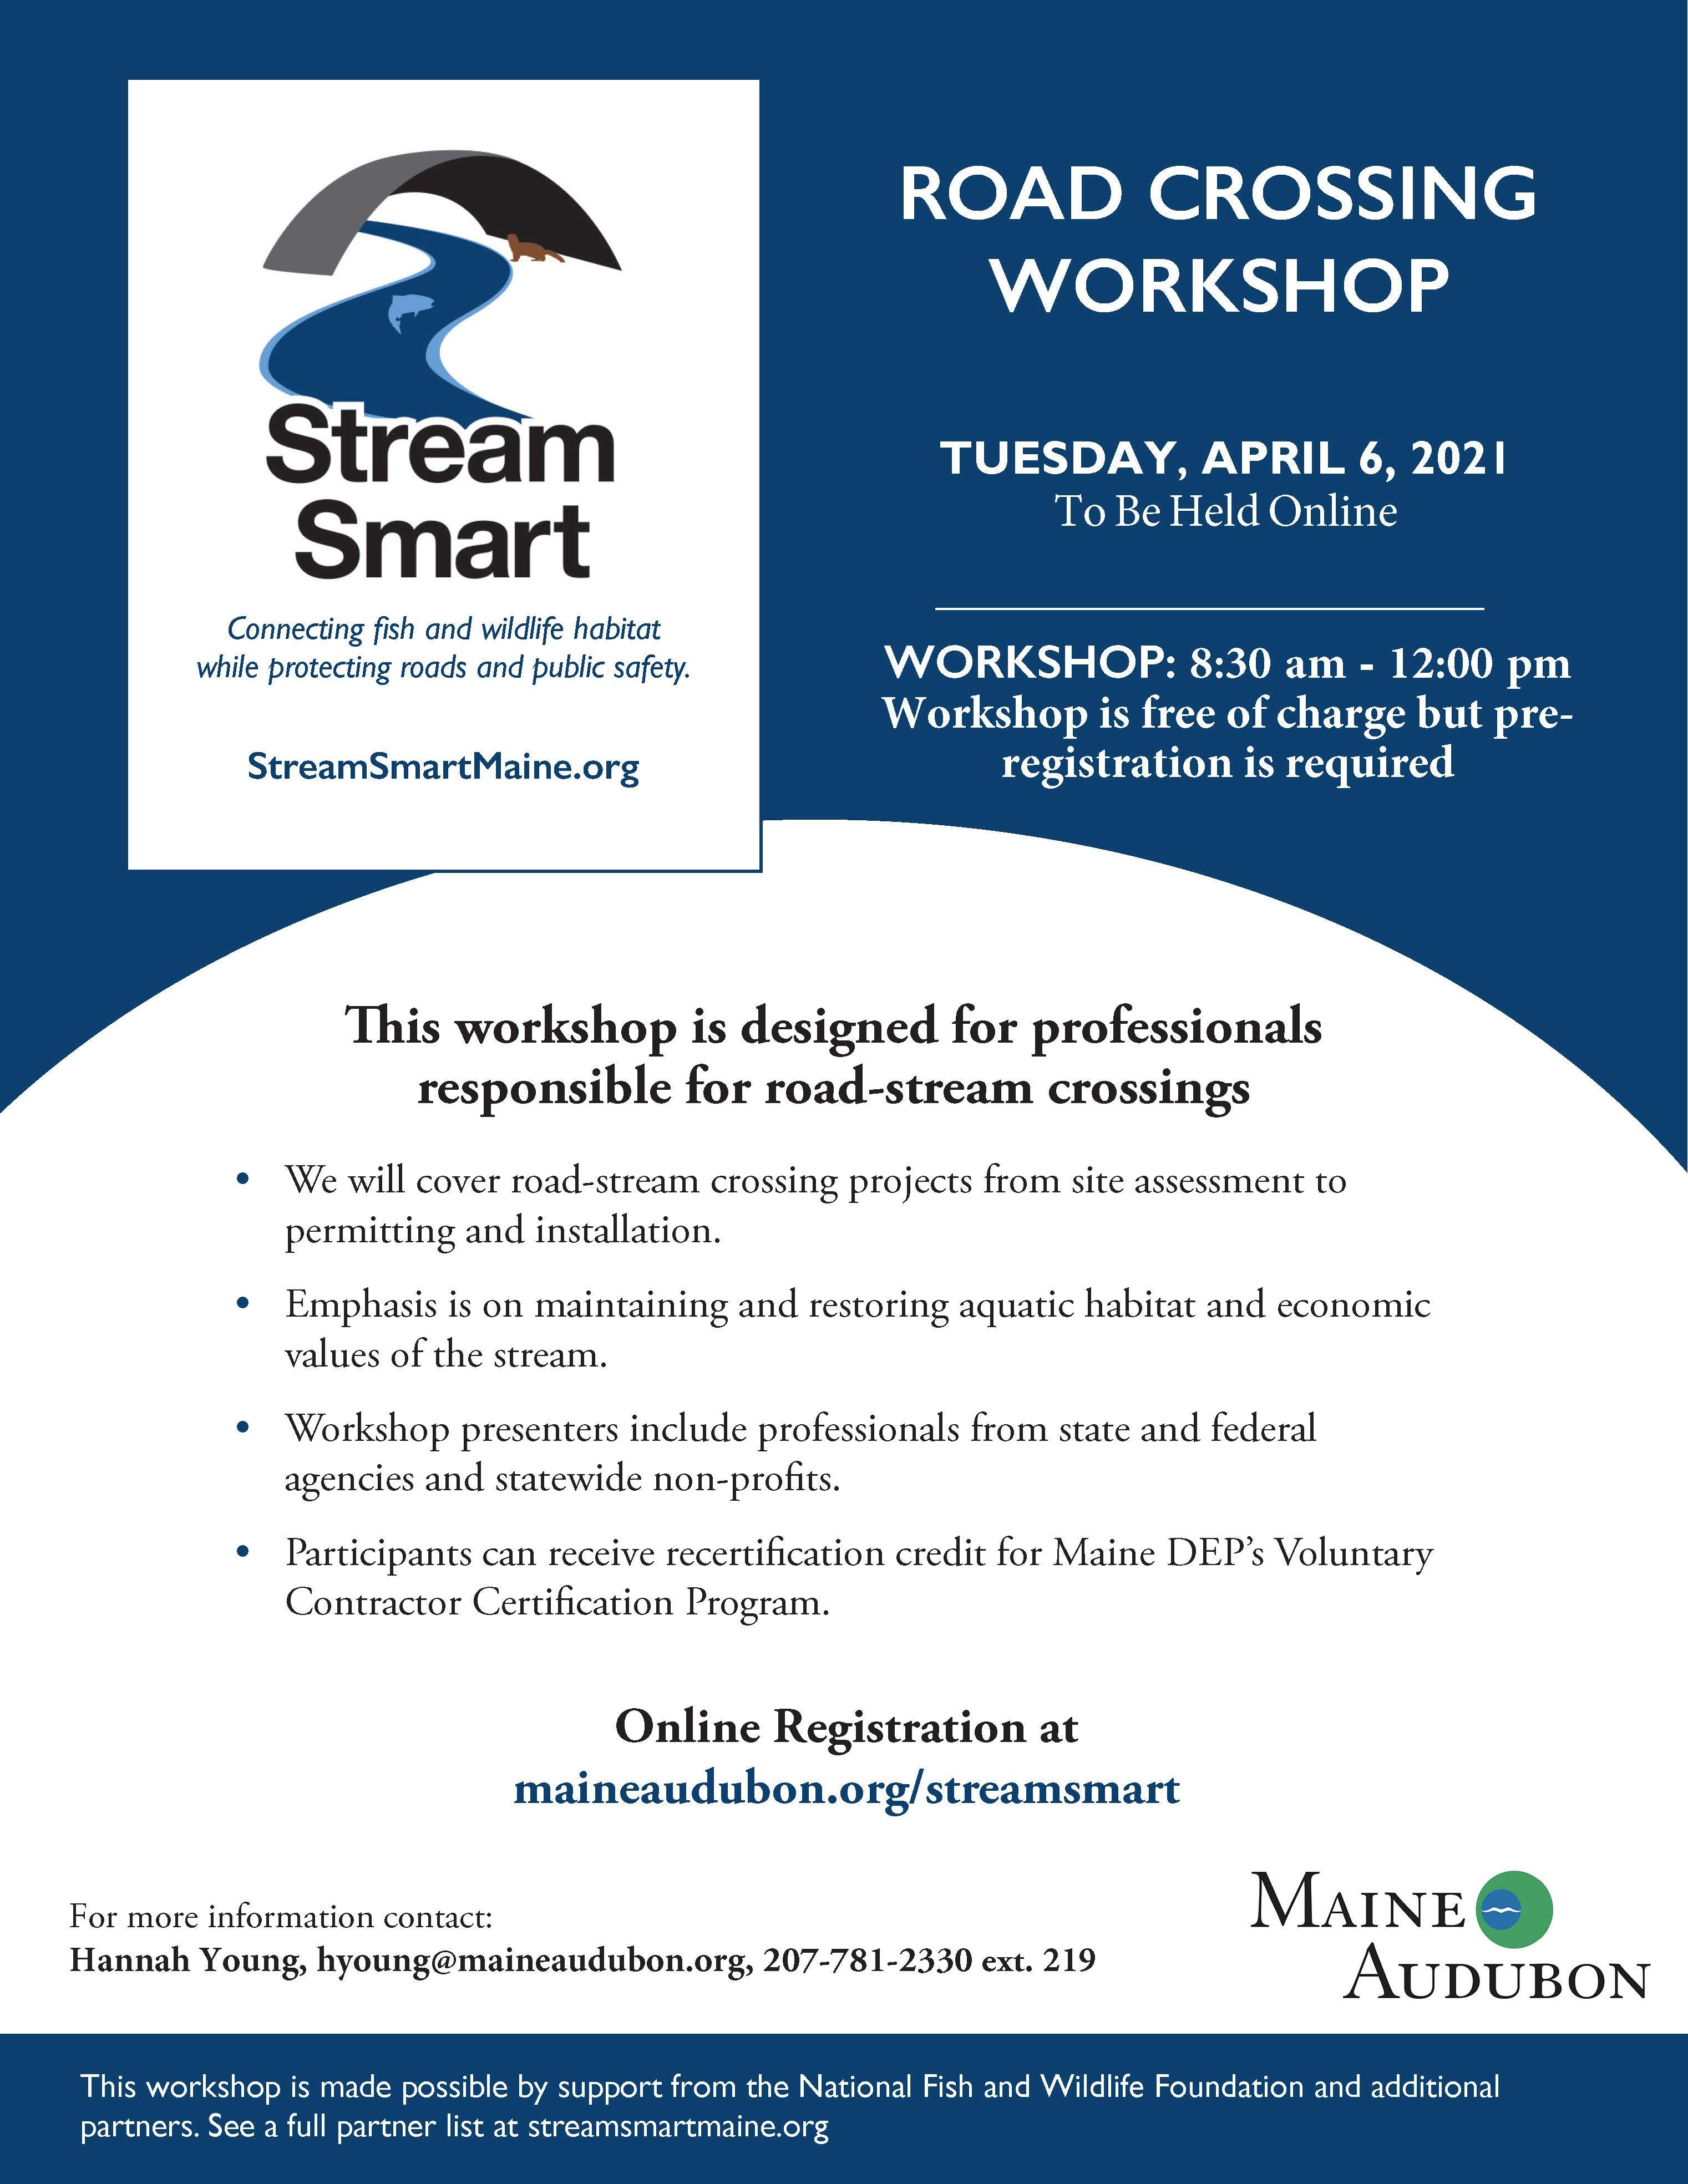 Maine Audubon: Stream Smart Workshop